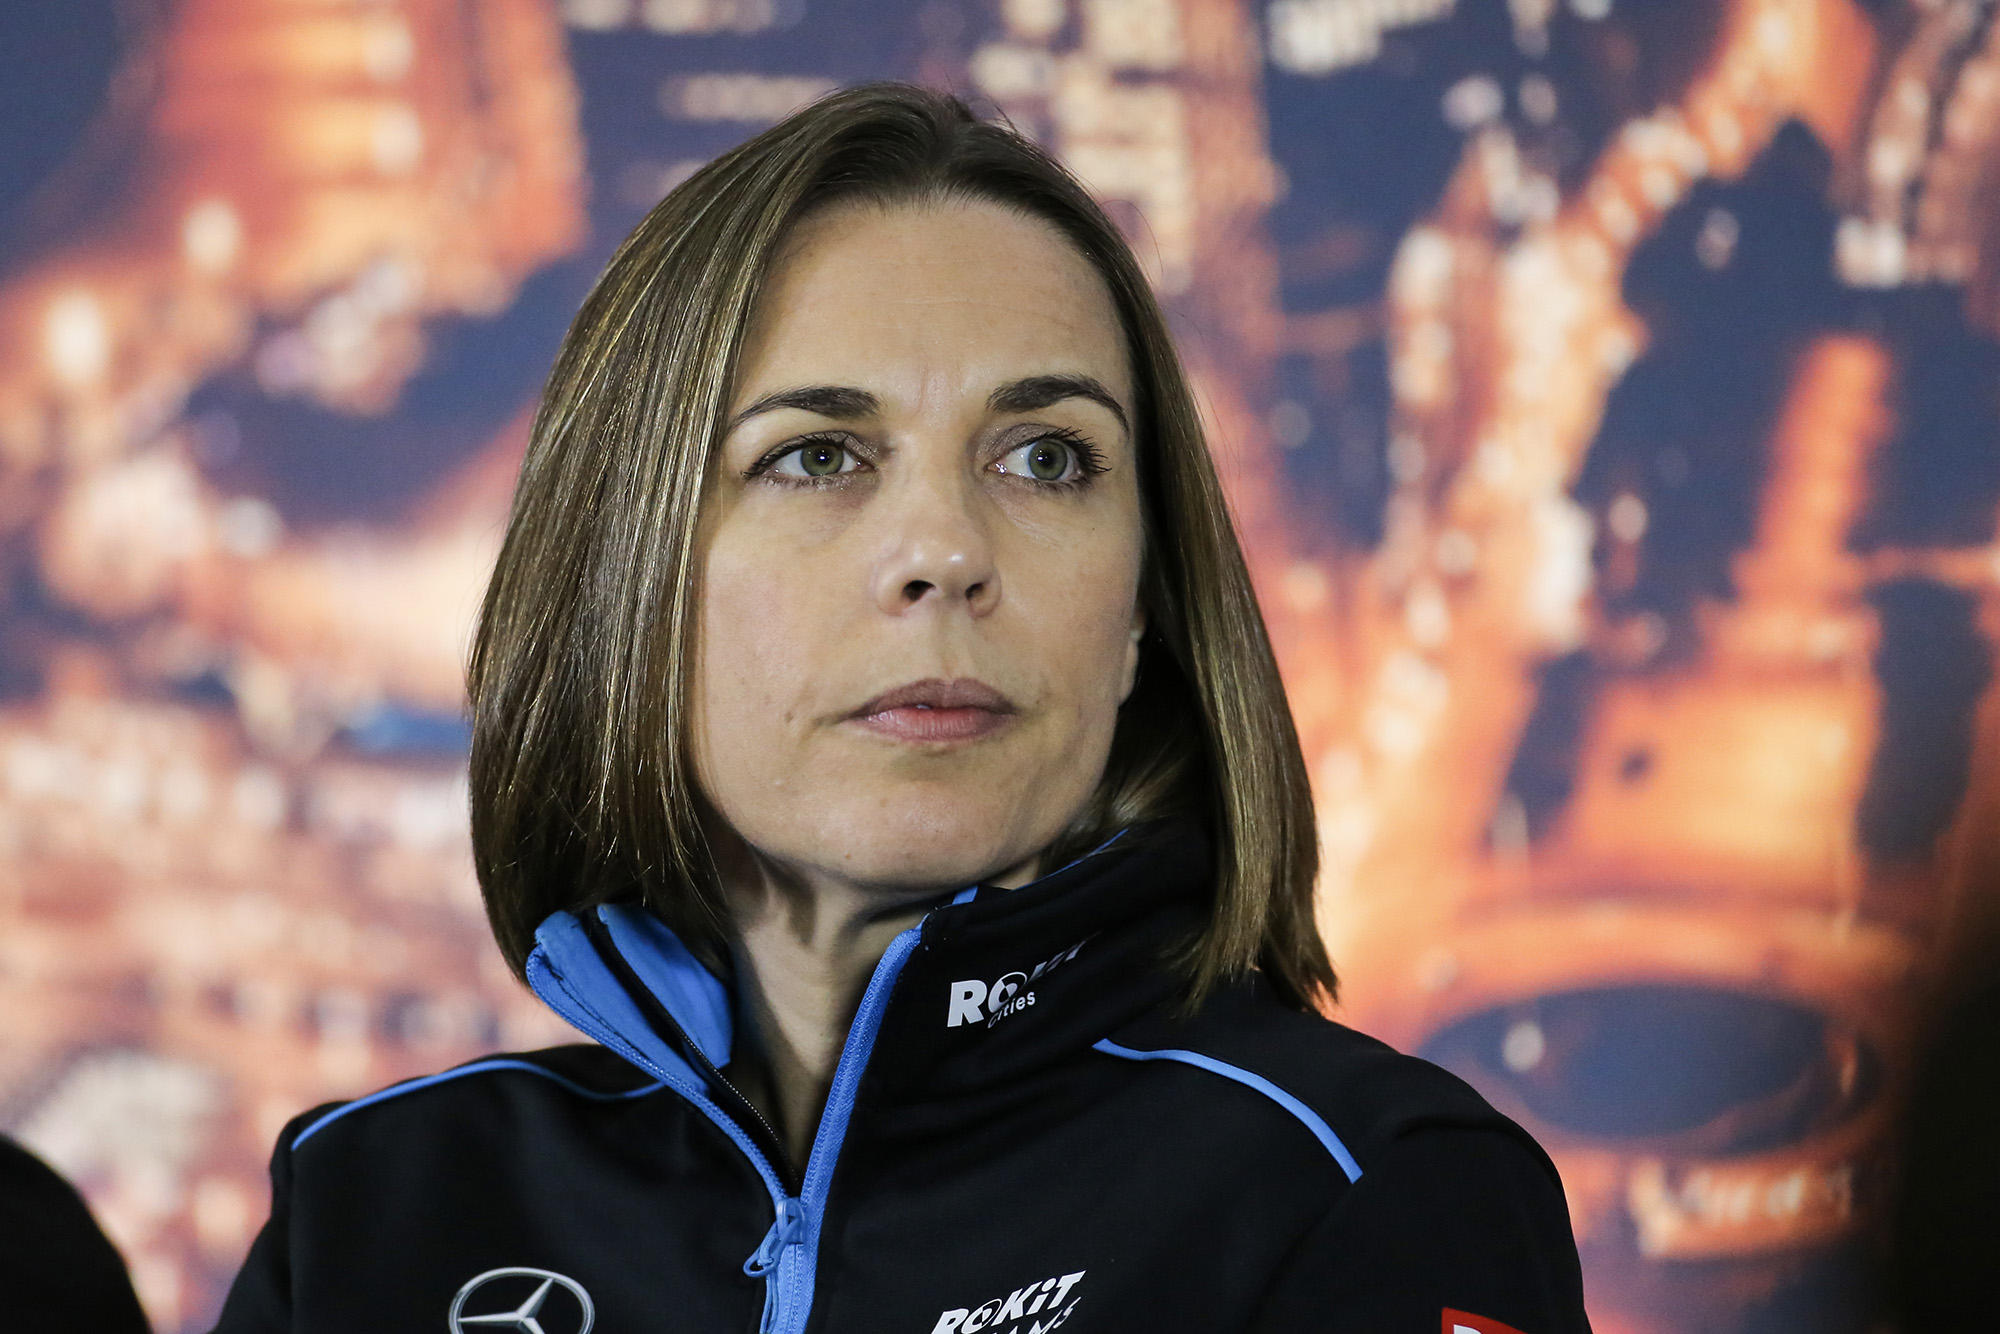 Claire Williams at 2020 F1 preseason testing